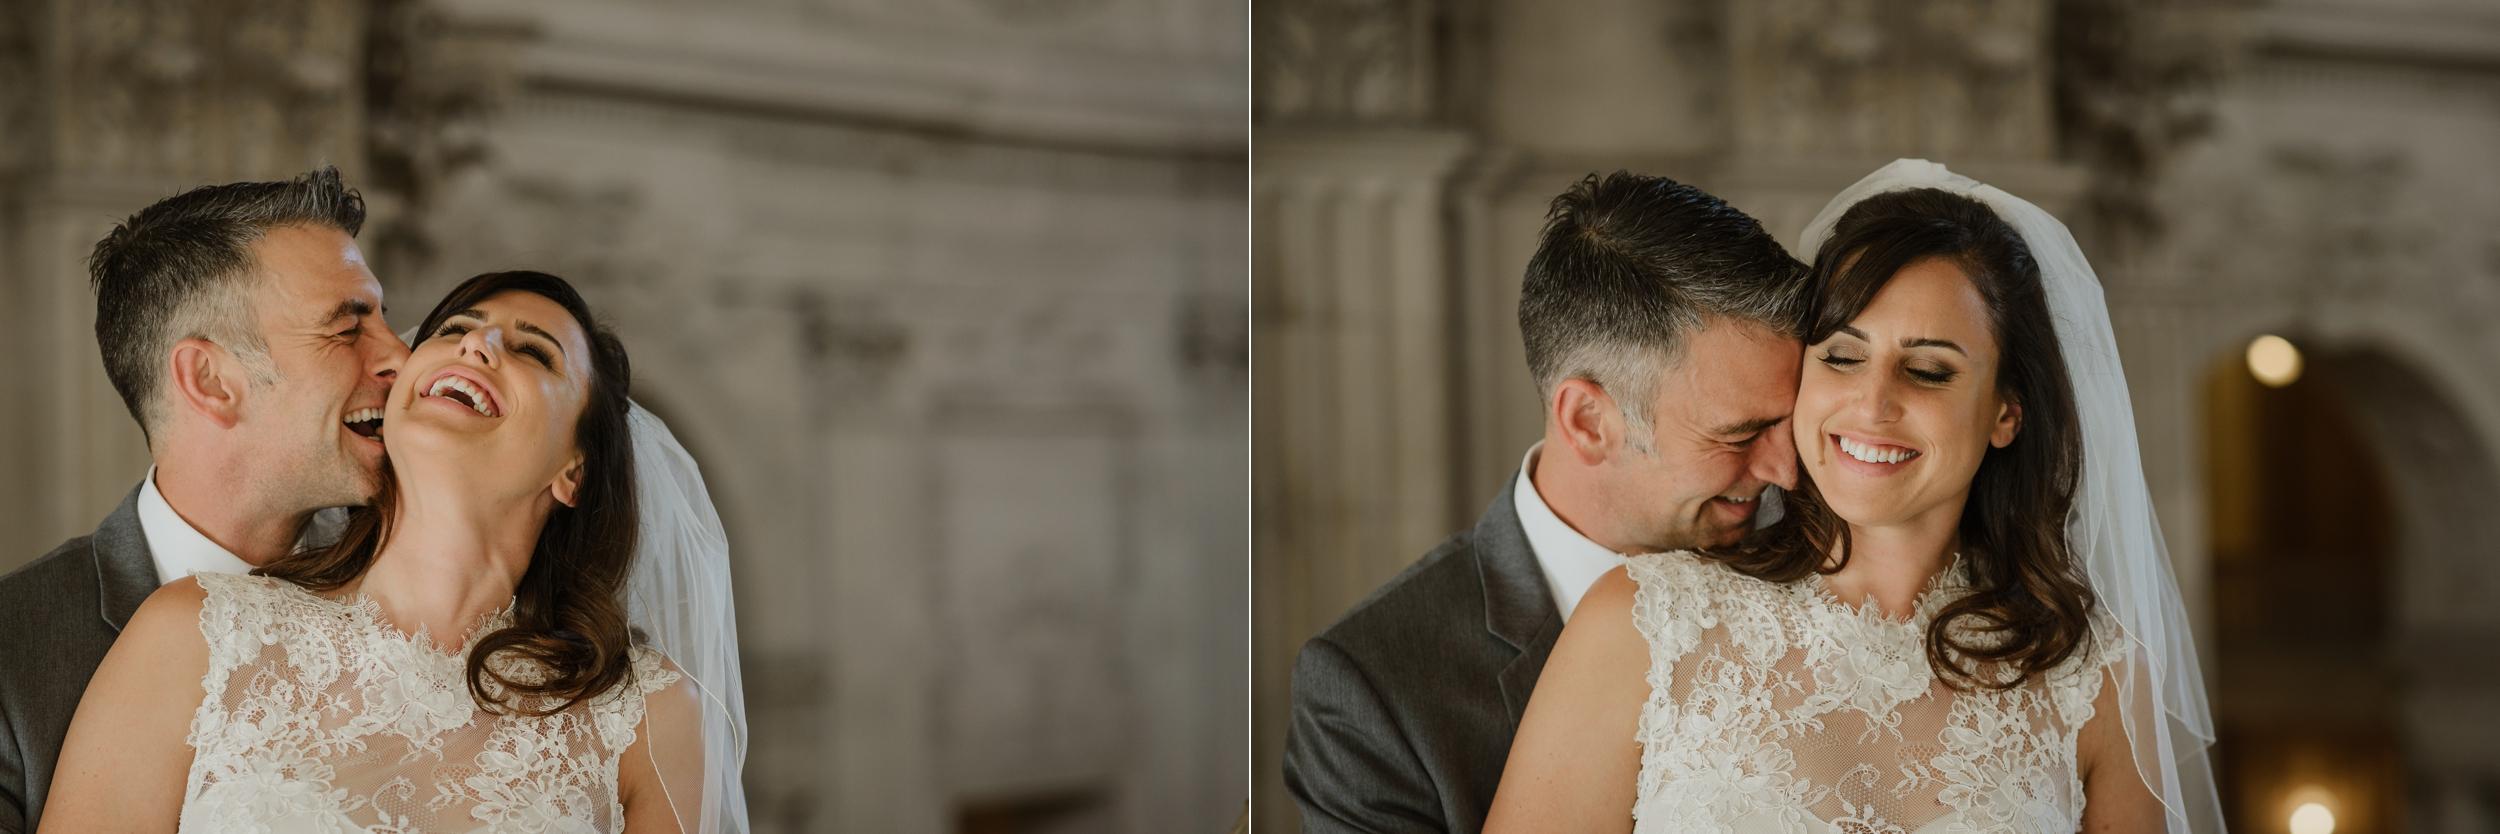 37-simple-san-francisco-city-hall-elopement-vivianchen-199_WEB.jpg